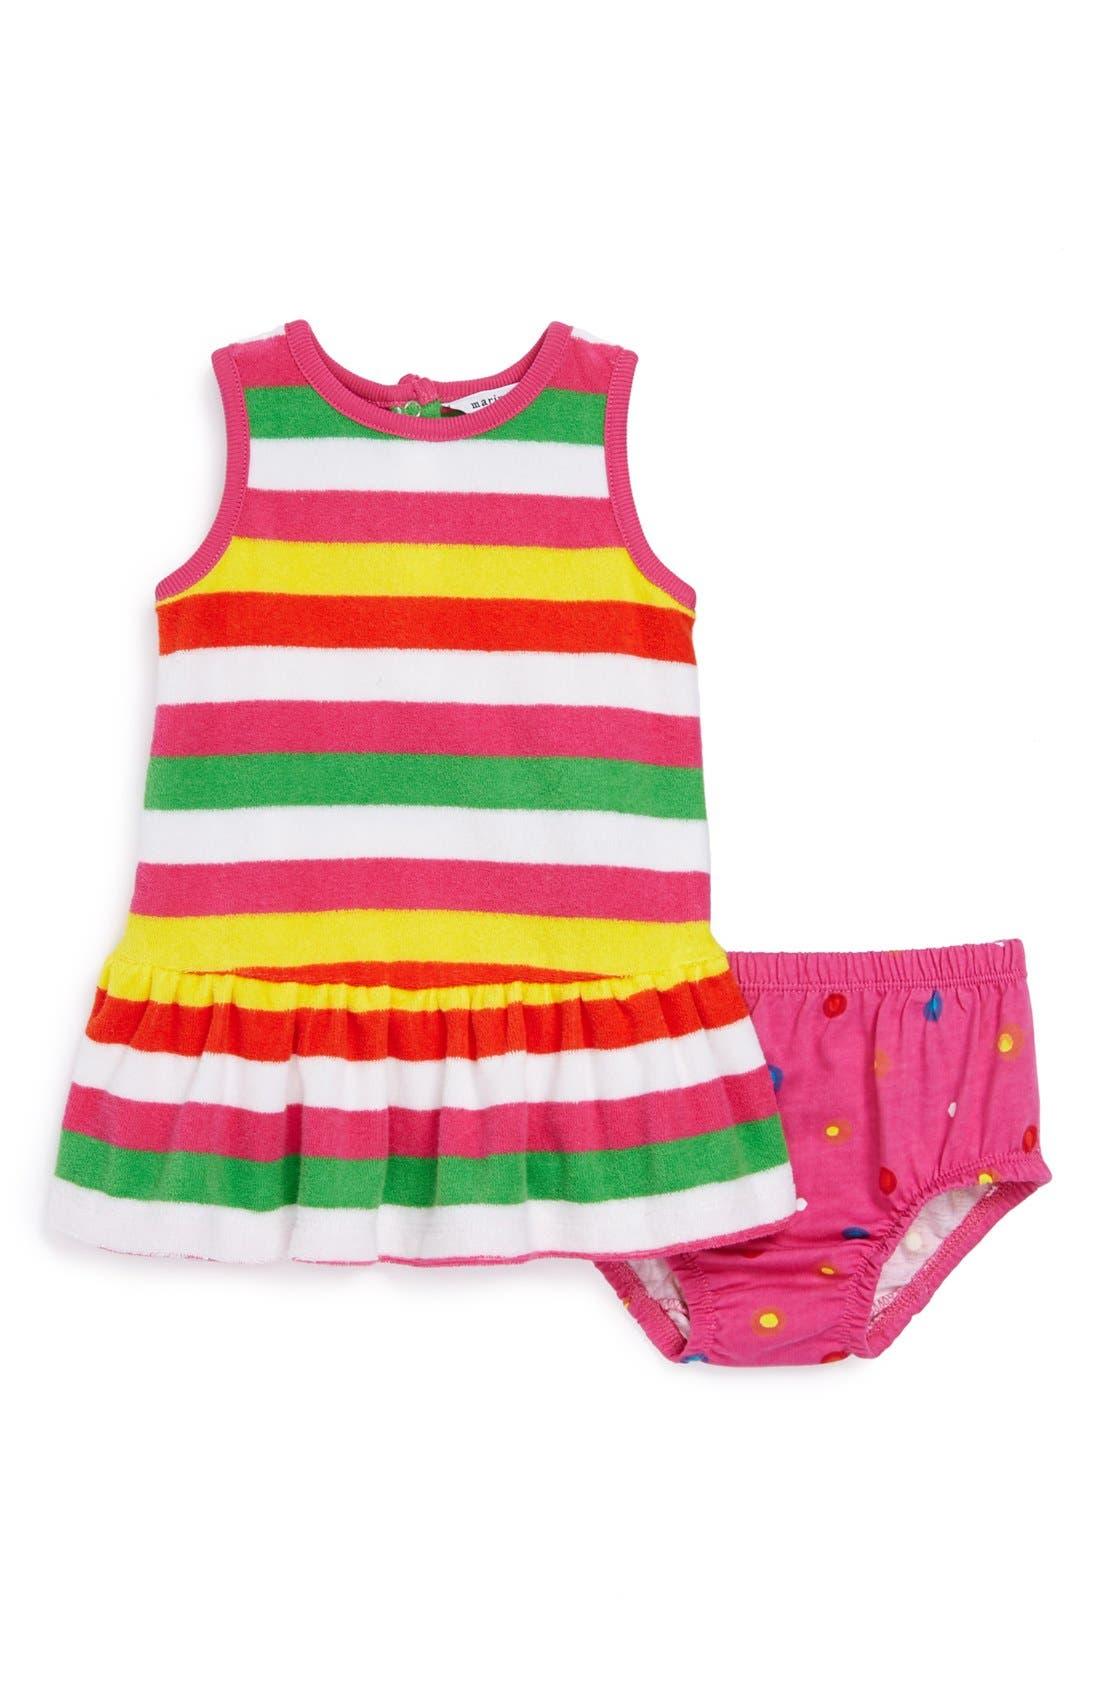 Main Image - Marimekko Terry Cloth Dress & Bloomers (Baby Girls)